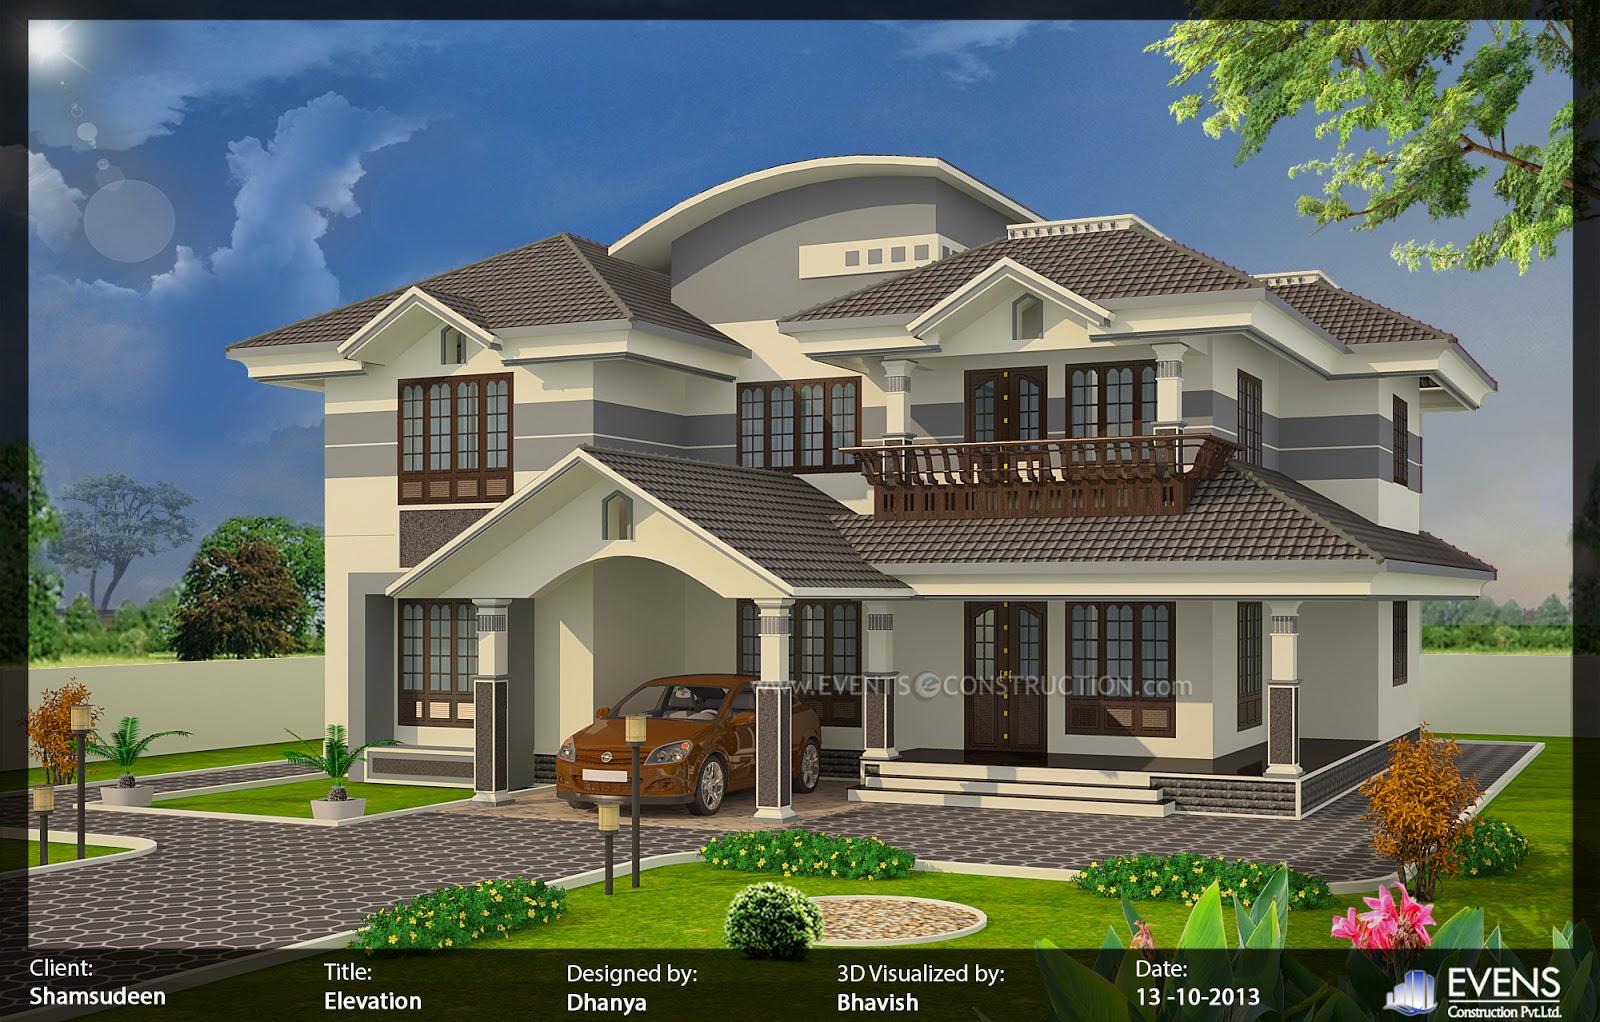 Evens construction pvt ltd 5 bedroom house exterior for 2400 sq ft house plans 3d